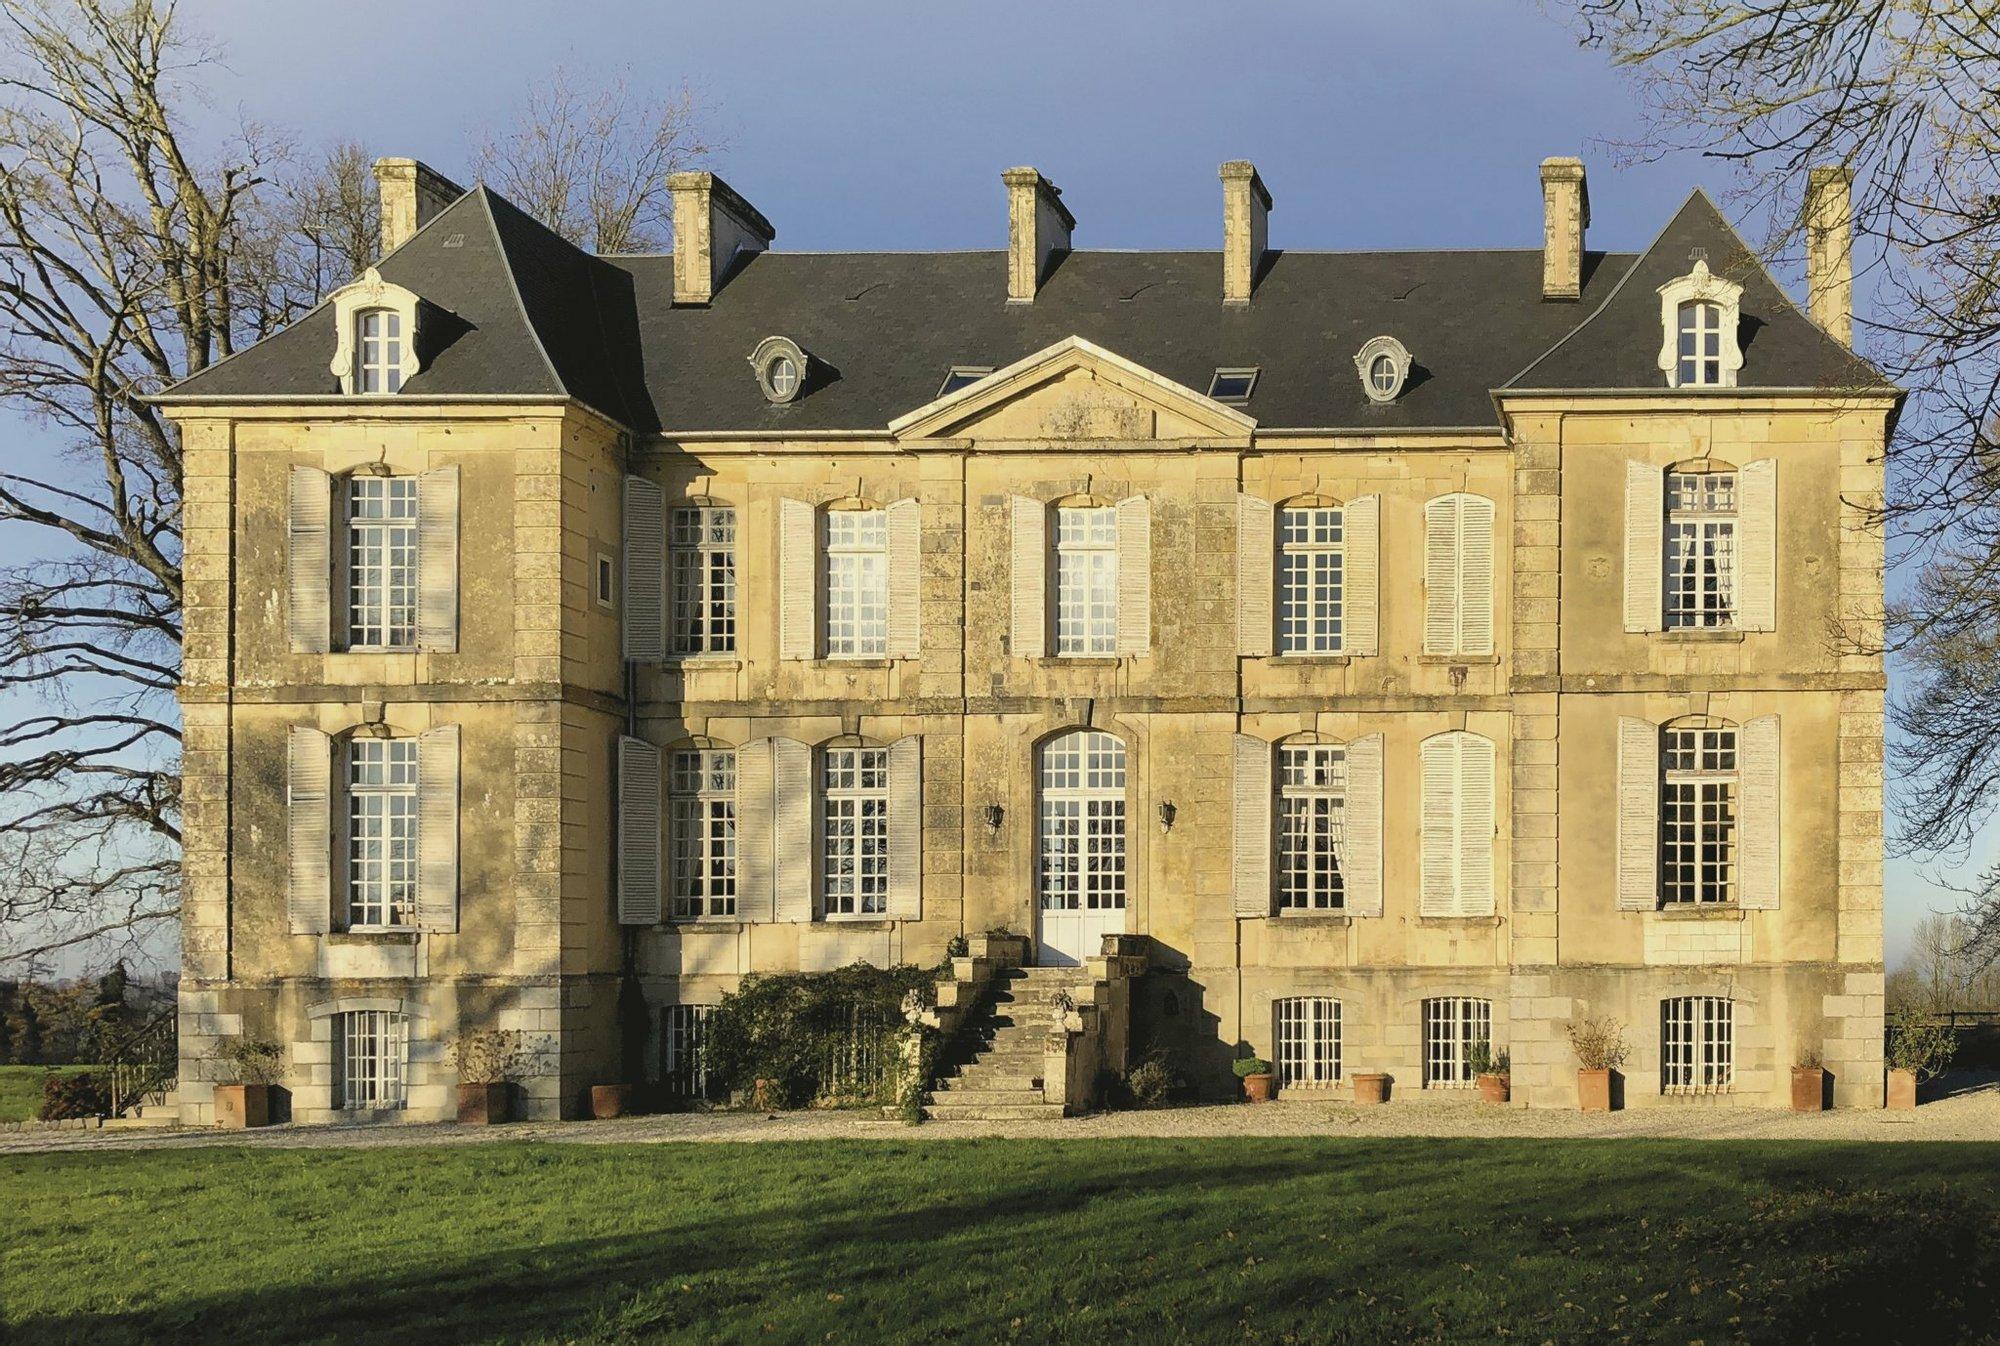 House in Villers-Bocage, Normandy, France 1